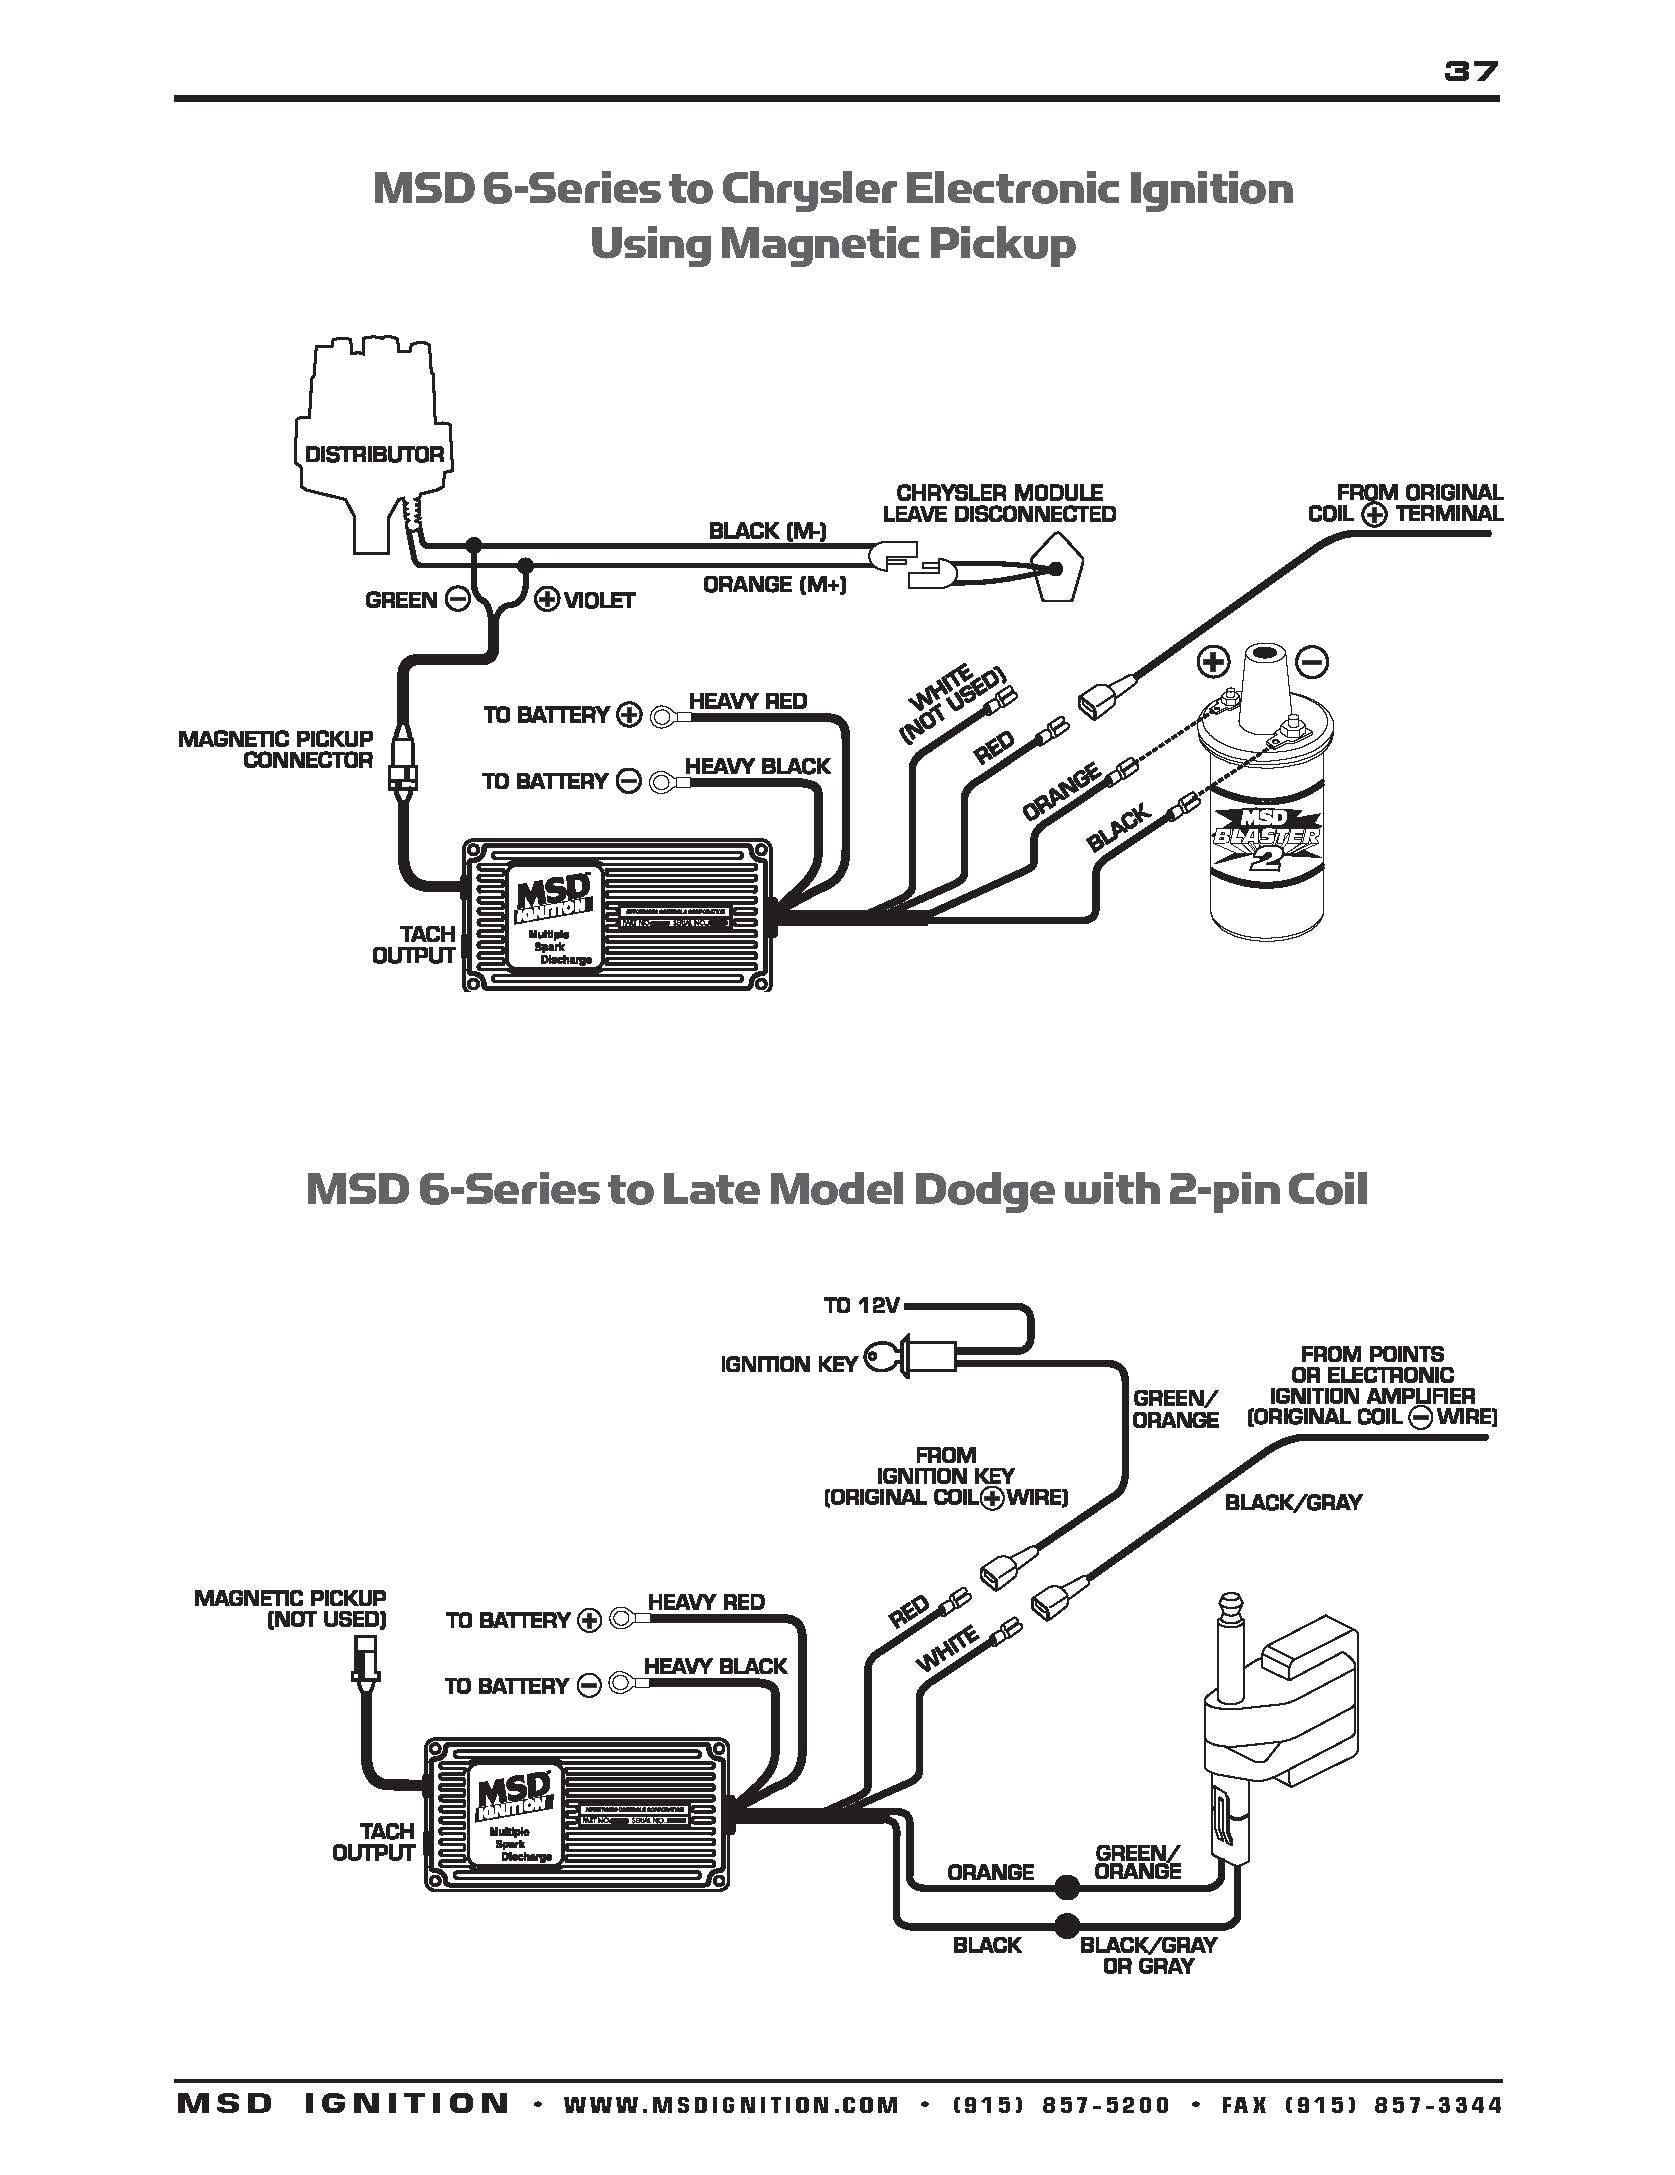 Msd Ignition 6Al Wiring Diagram Chevy | Manual E-Books - Msd Ignition Wiring Diagram Chevy